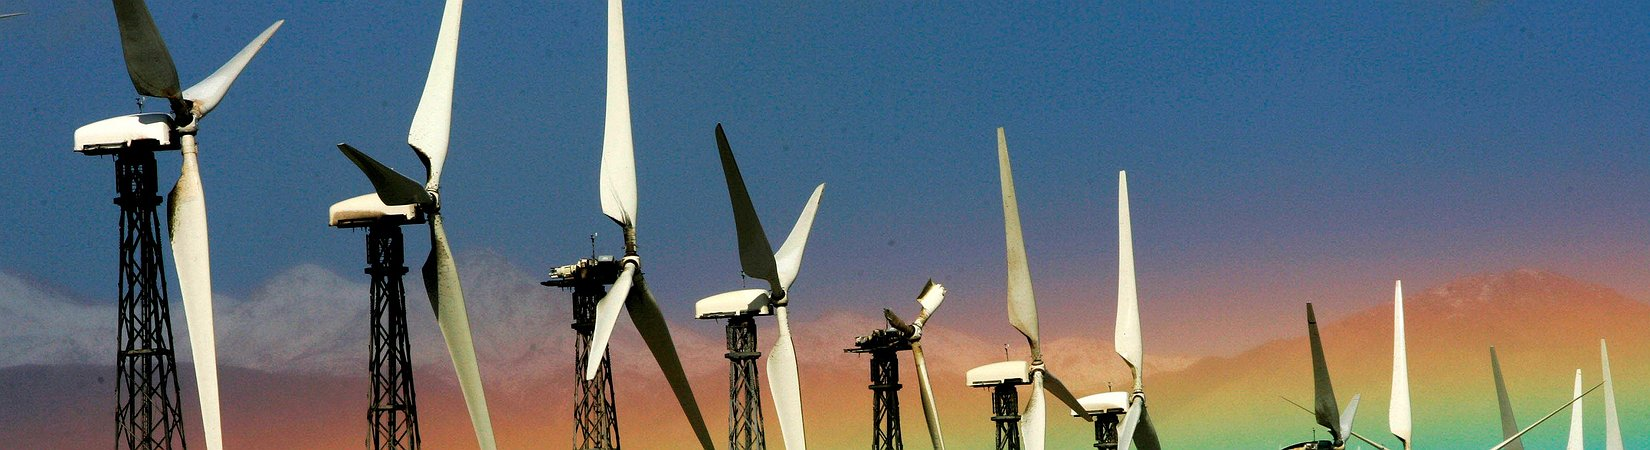 Rekord-Windkraft